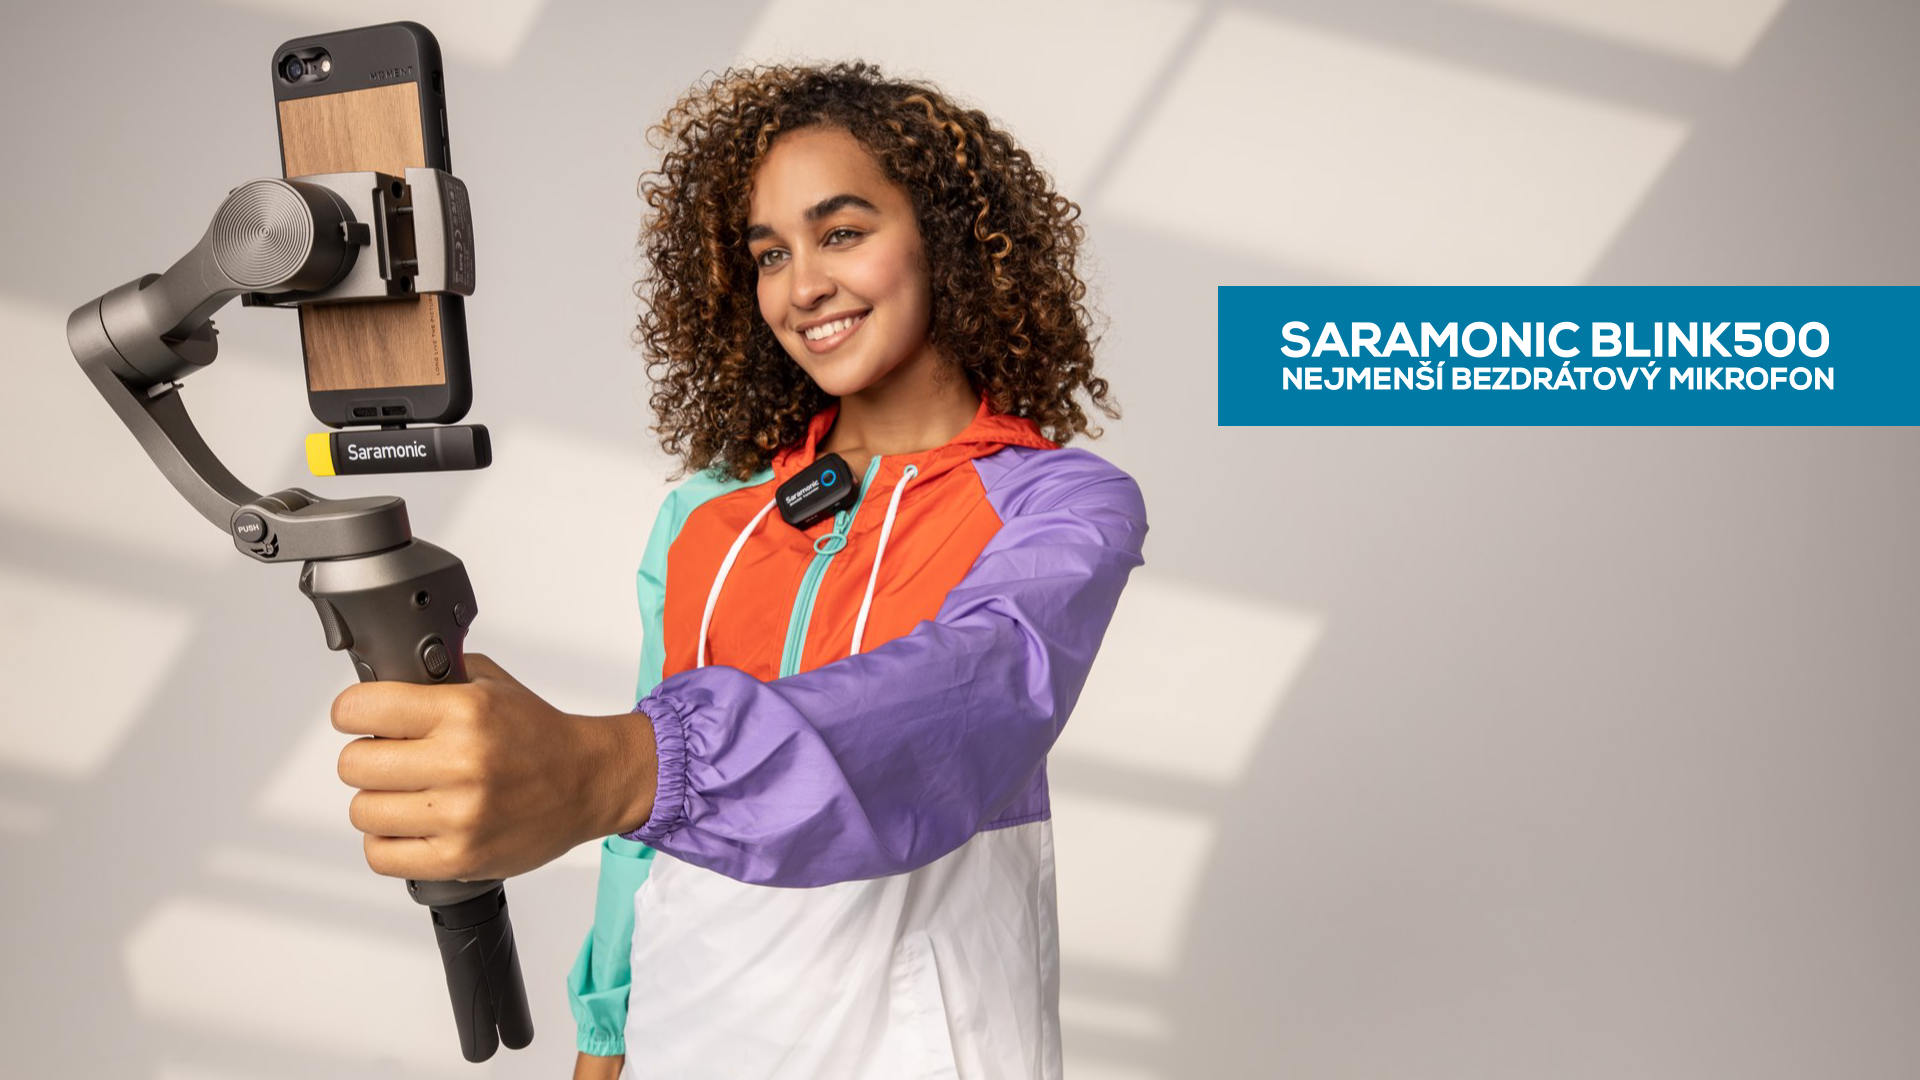 Saramonic Blink500